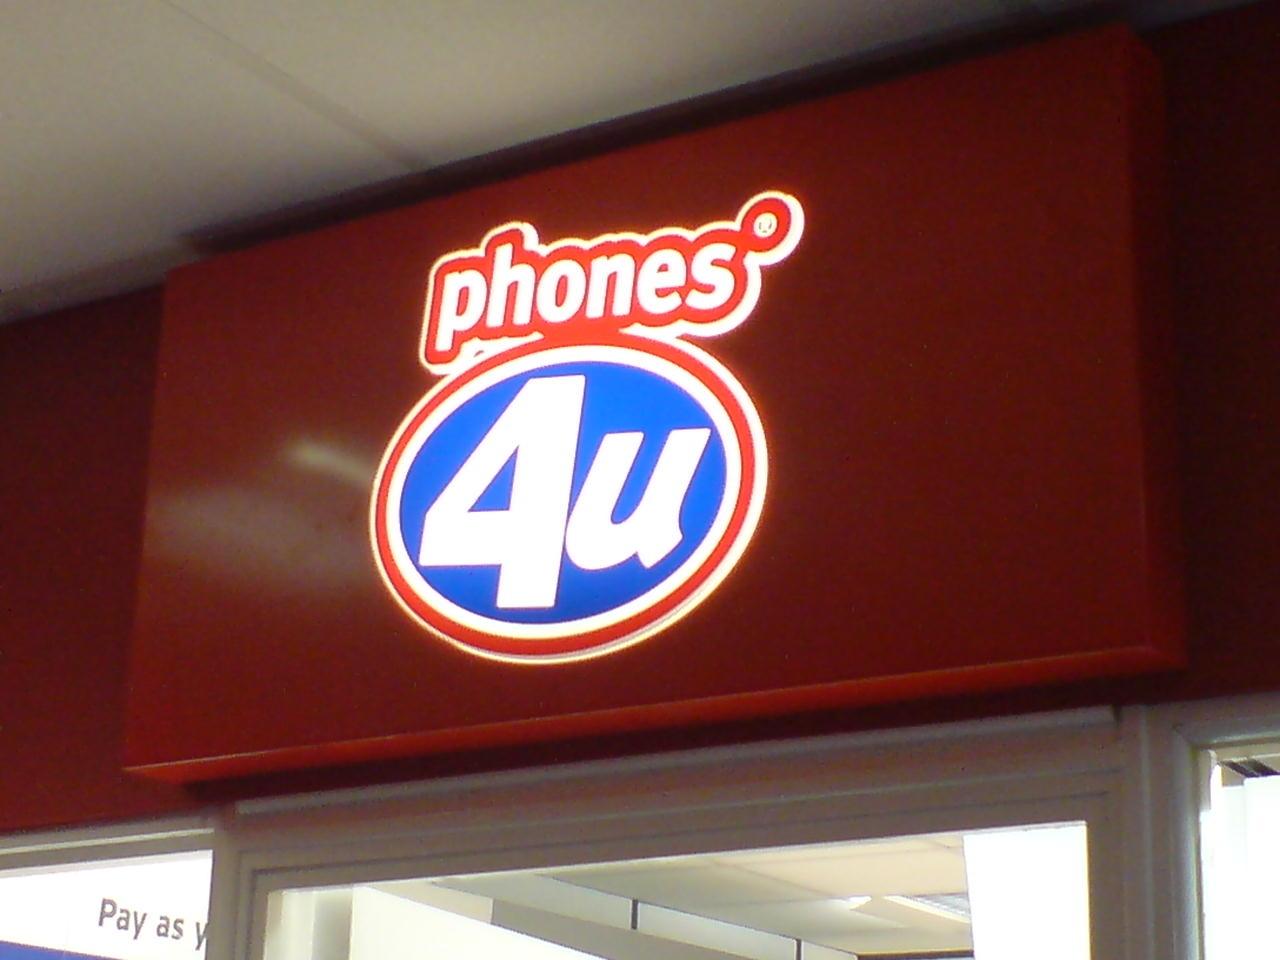 Phones 4u news